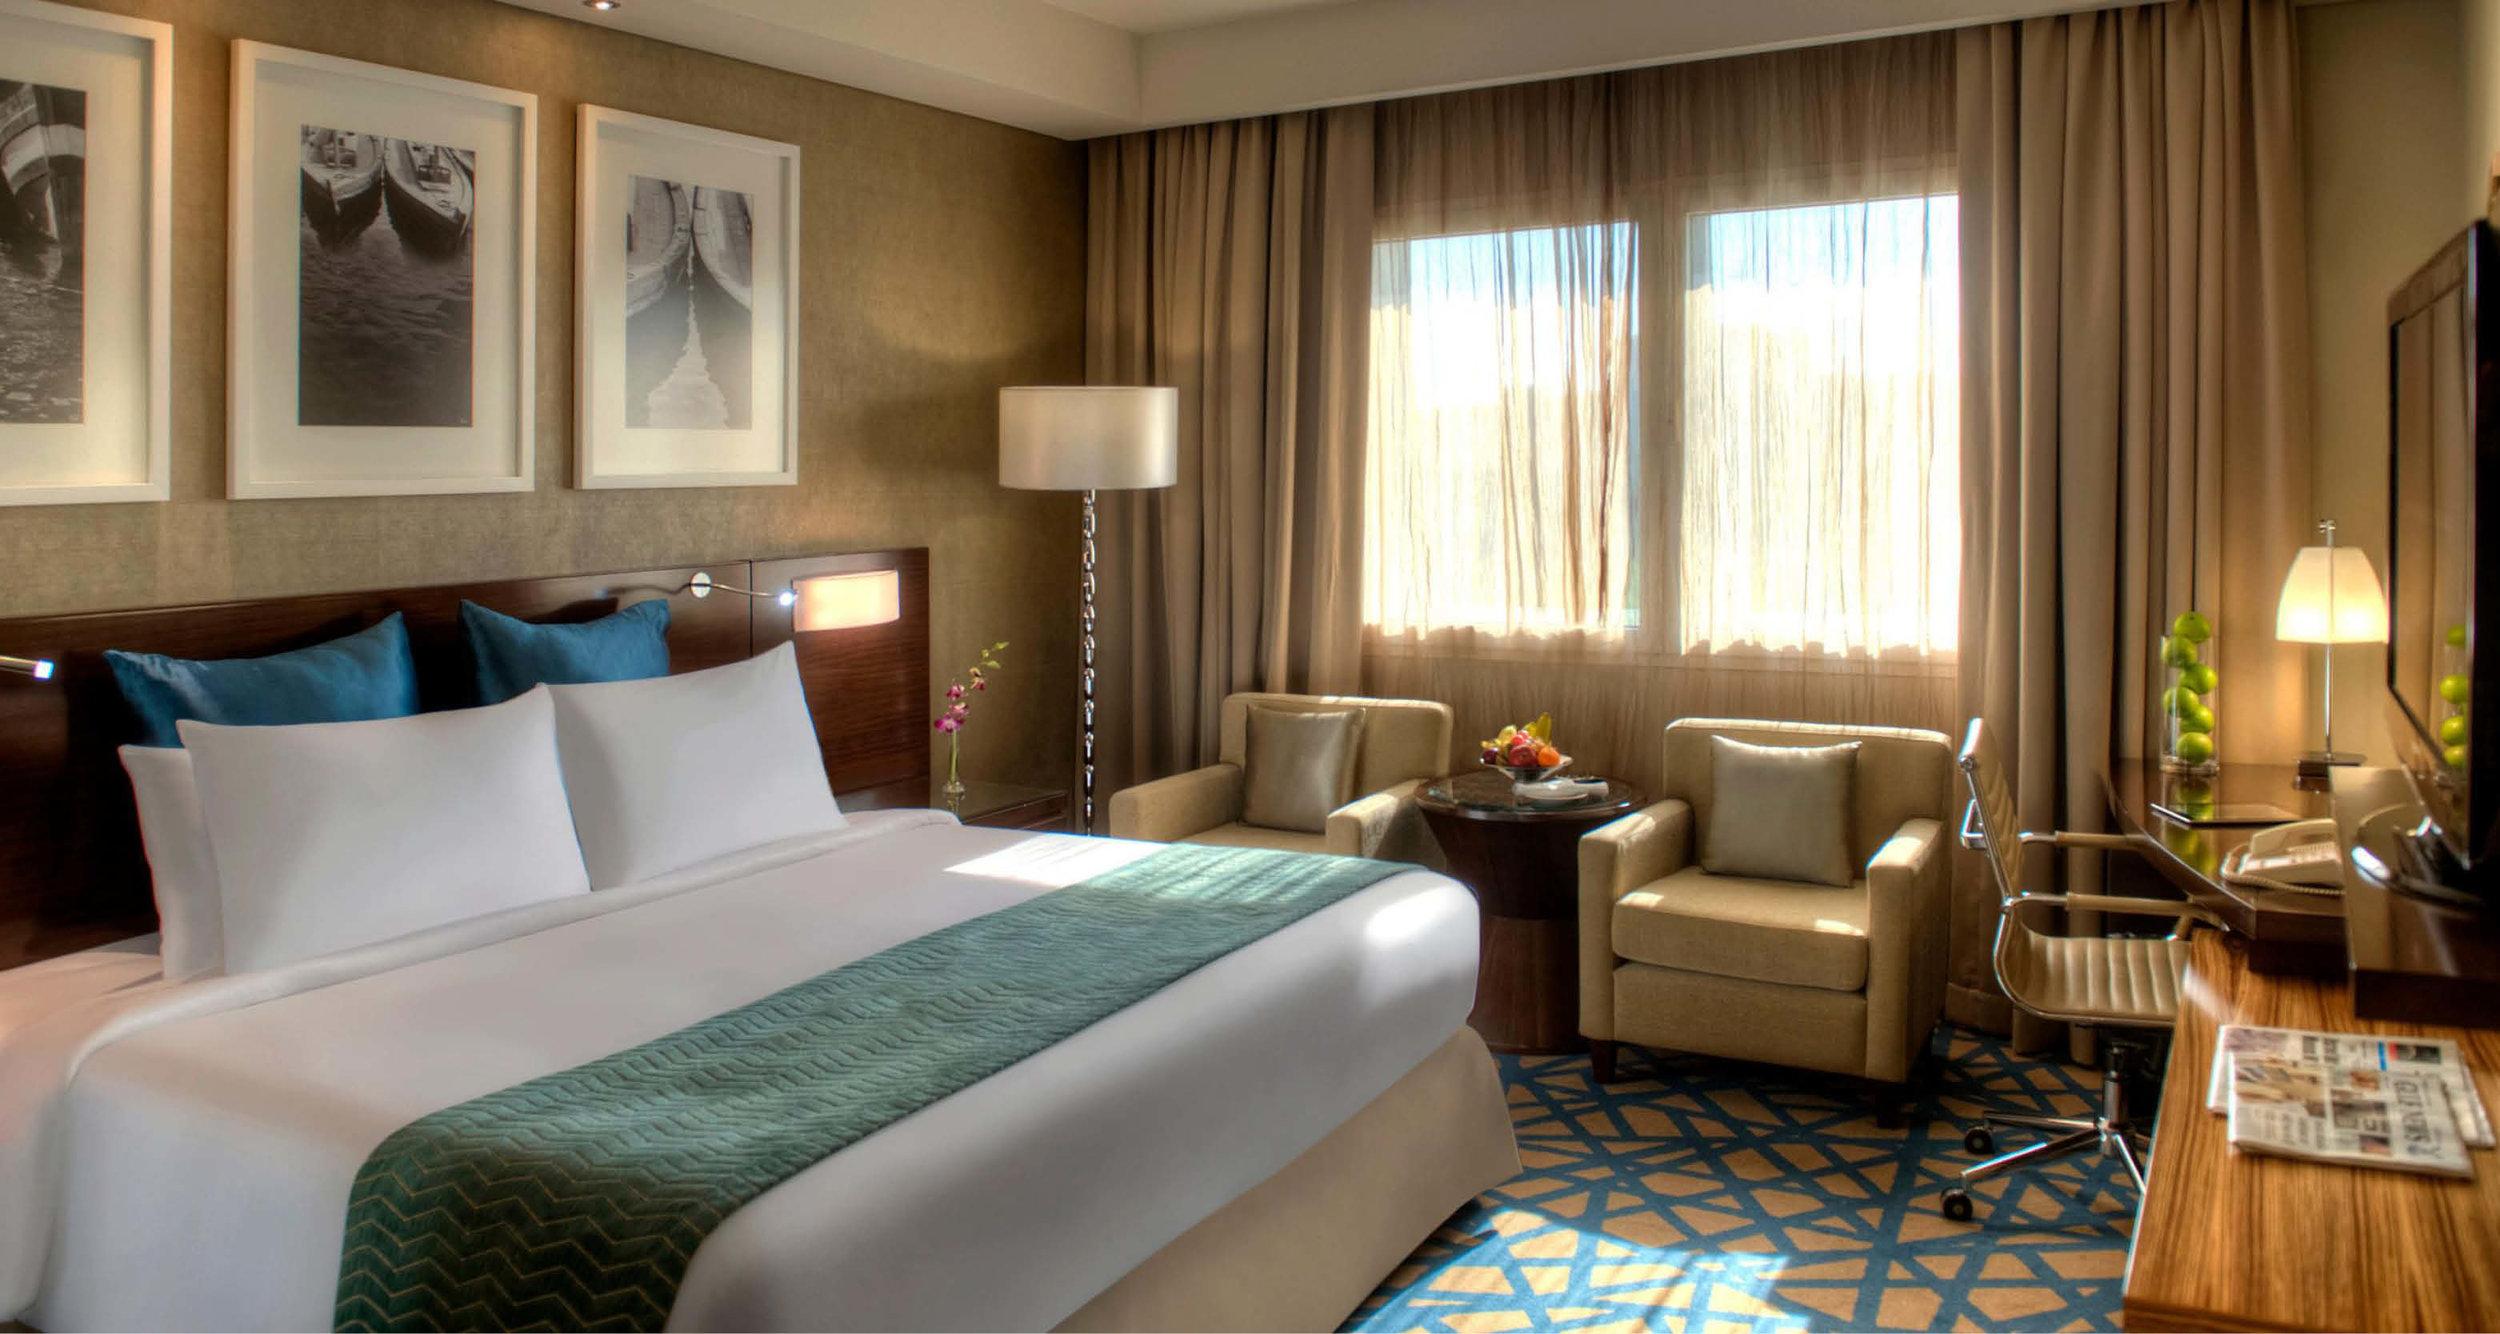 Dream-Maker-Travel-Accom-Dubai-Room.jpg